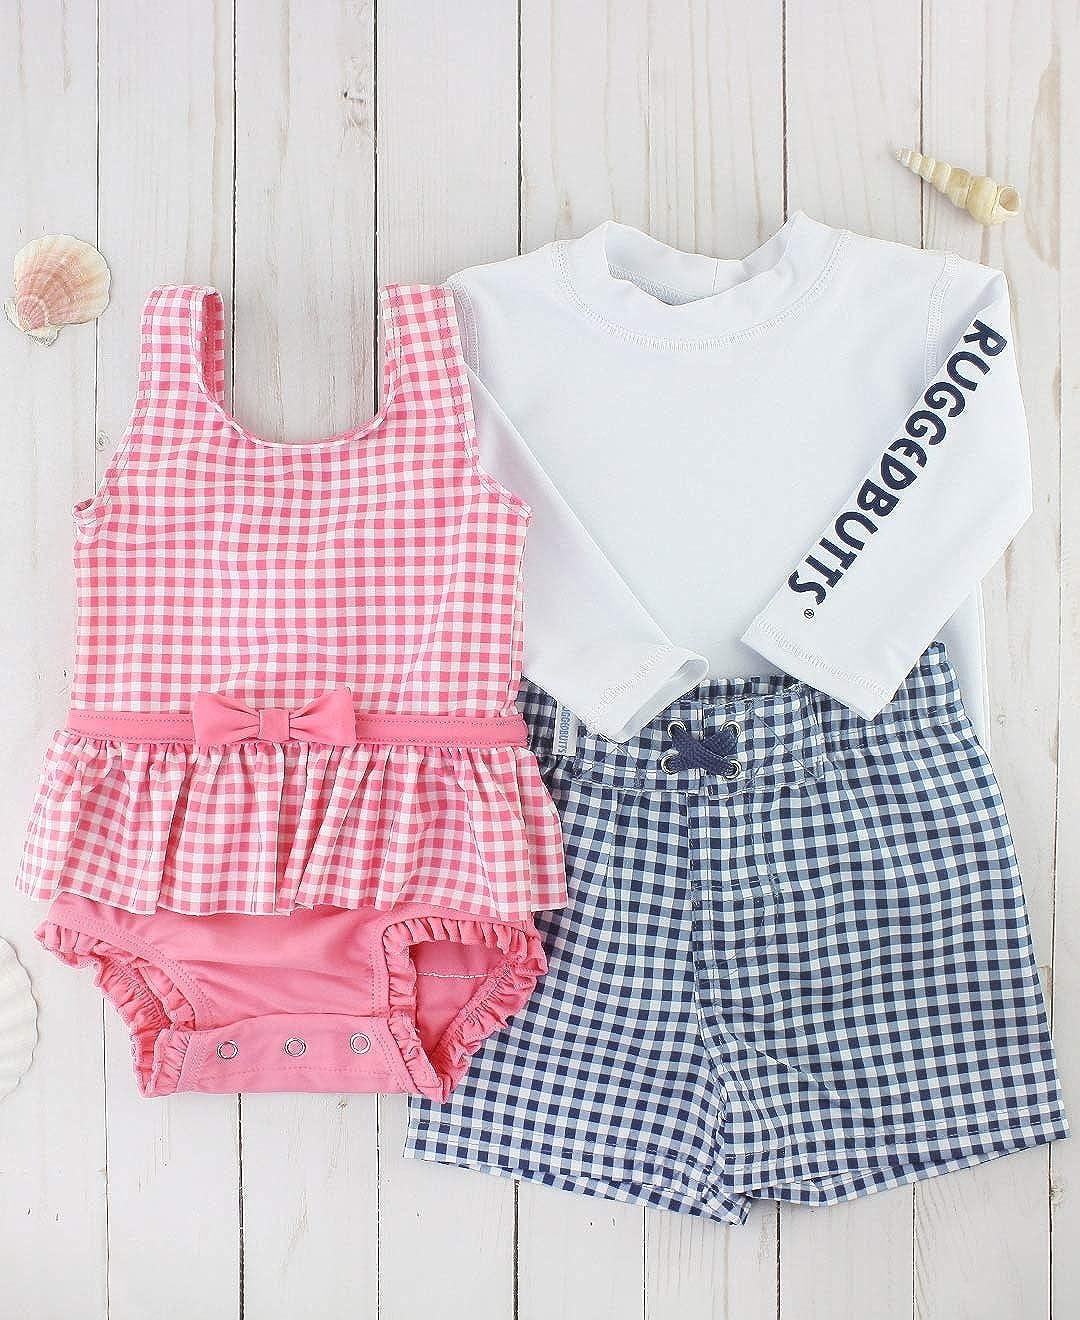 Sun Protection RuffleButts Infant//Toddler Girls Peplum Short Sleeve One Piece Swimsuit UPF 50